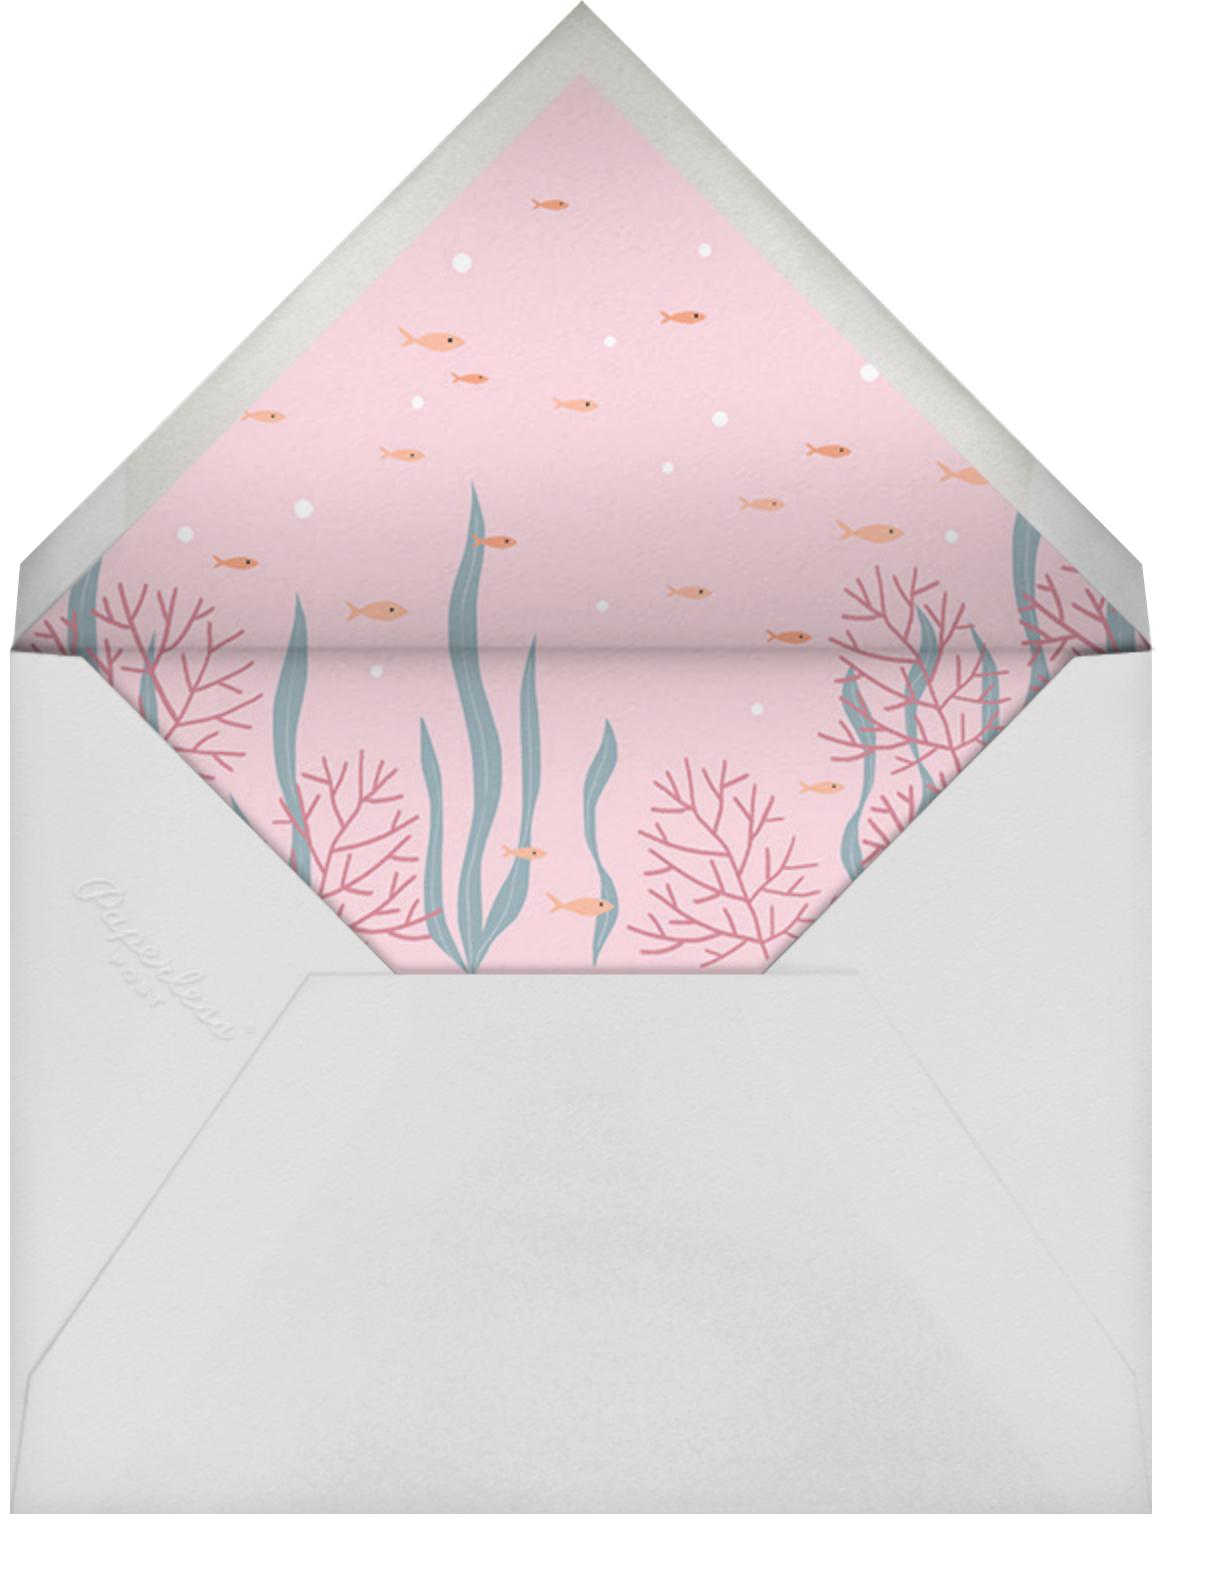 Mermaid Cove - Tan - Paperless Post - Pool party - envelope back